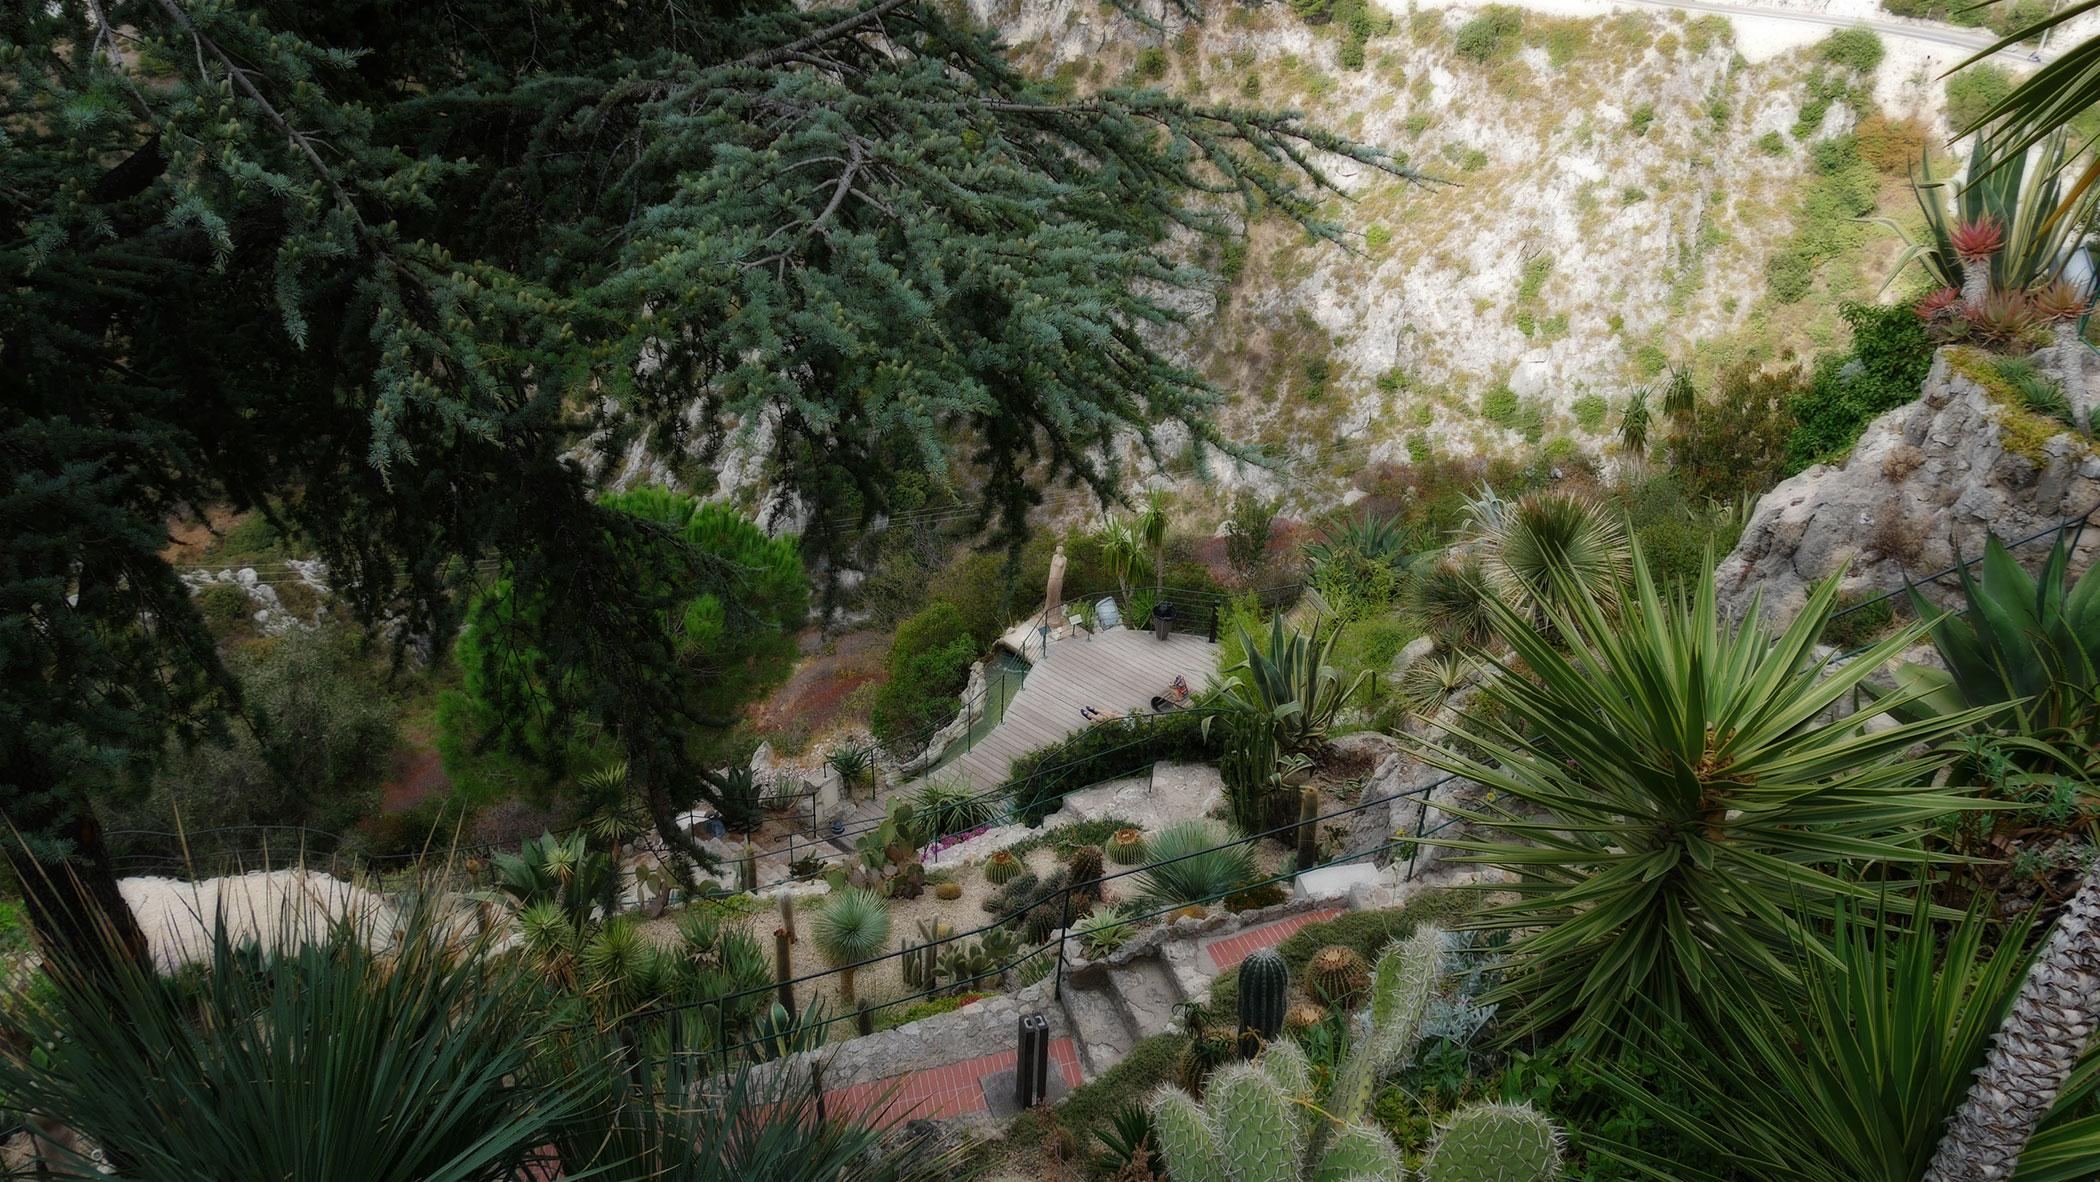 Jardin d'Exotique in Èze